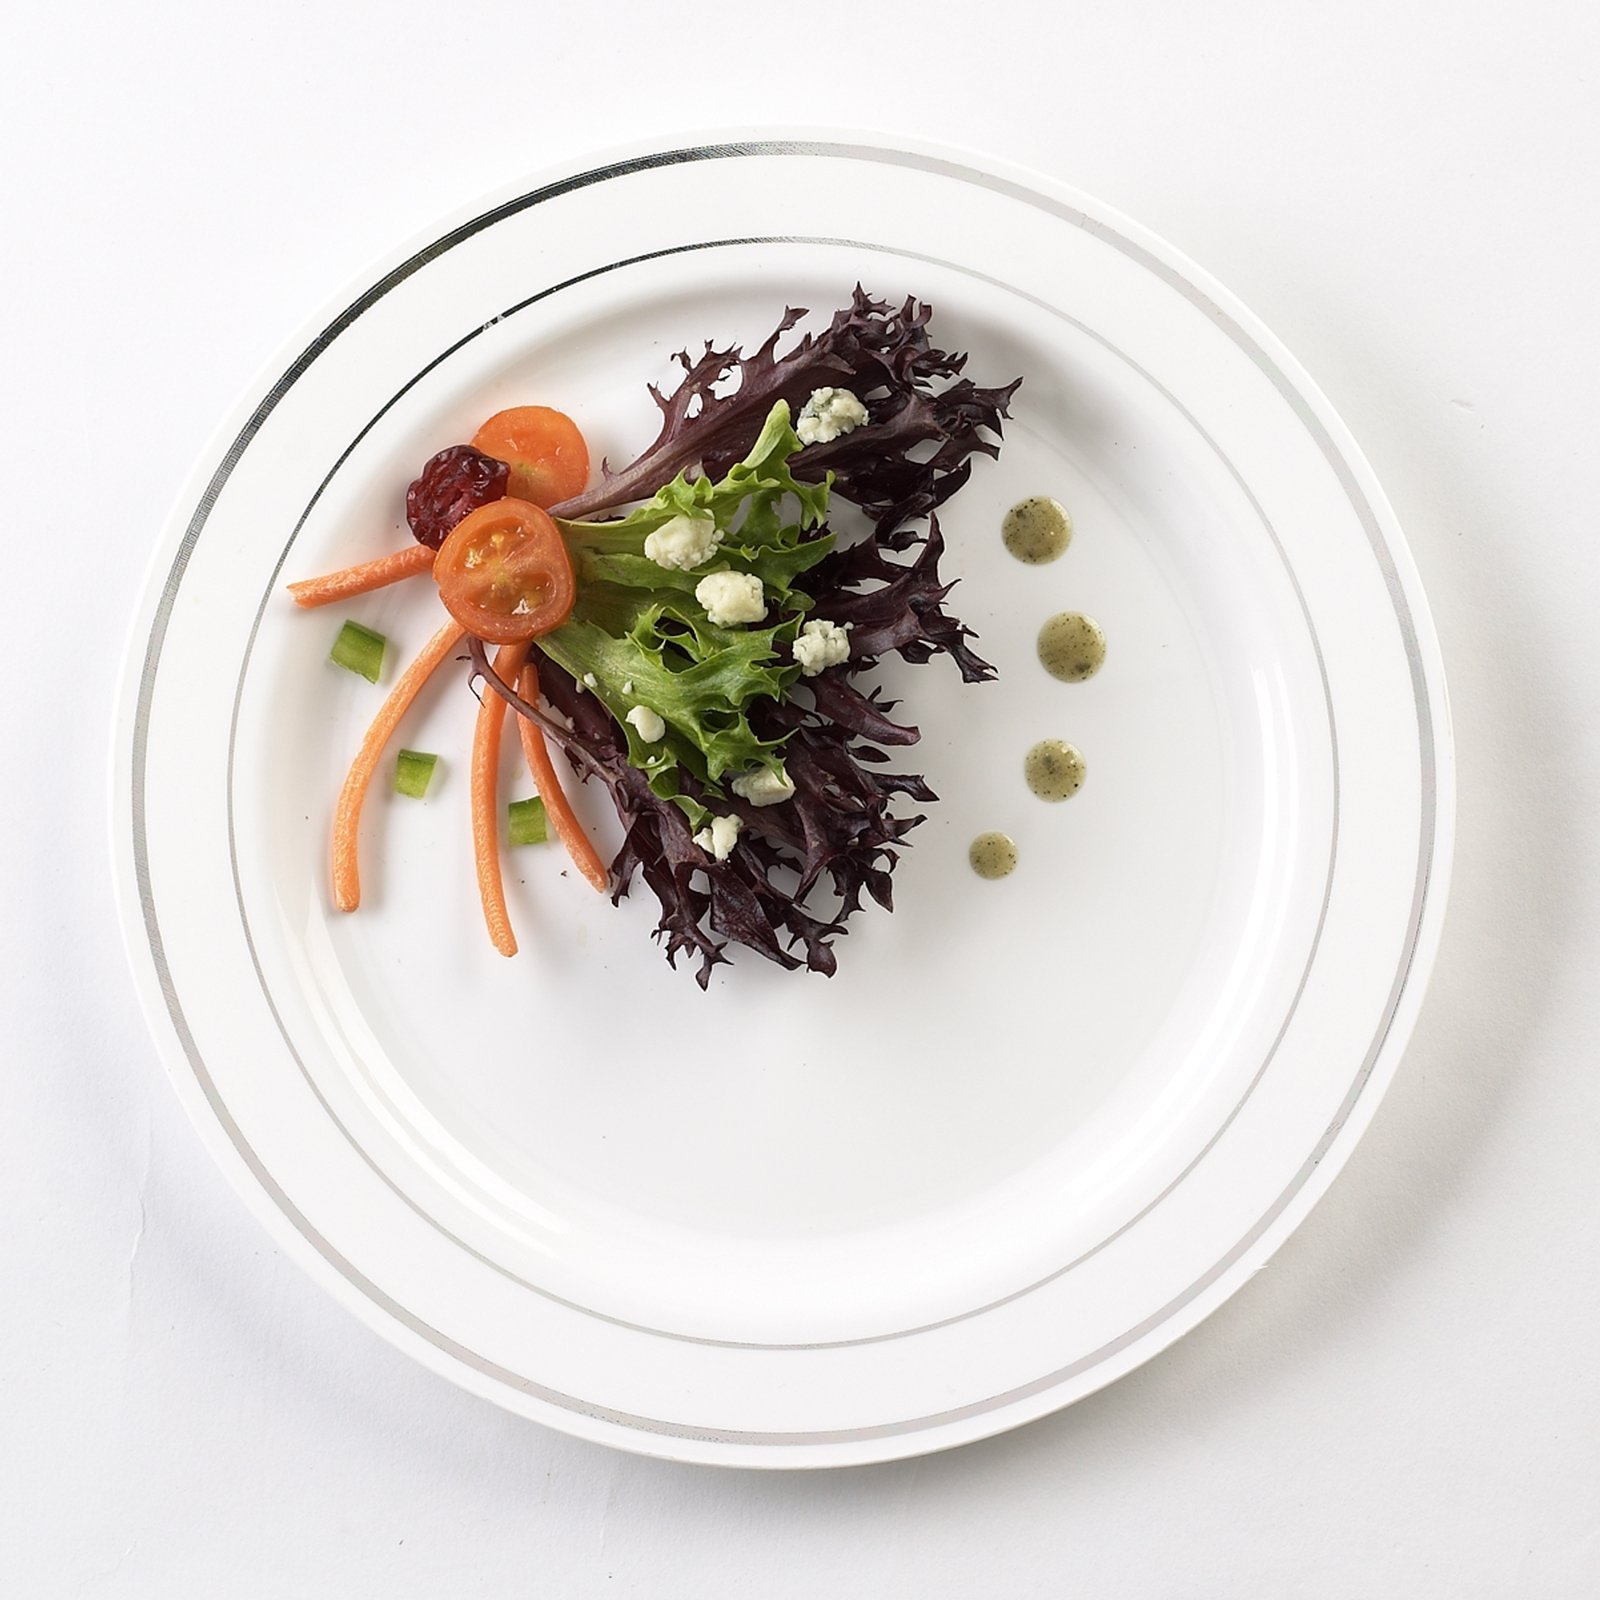 EMI Yoshi Koyal Glimmerware Salad Plates, 7.5-Inch, White and Silver, Set of 120